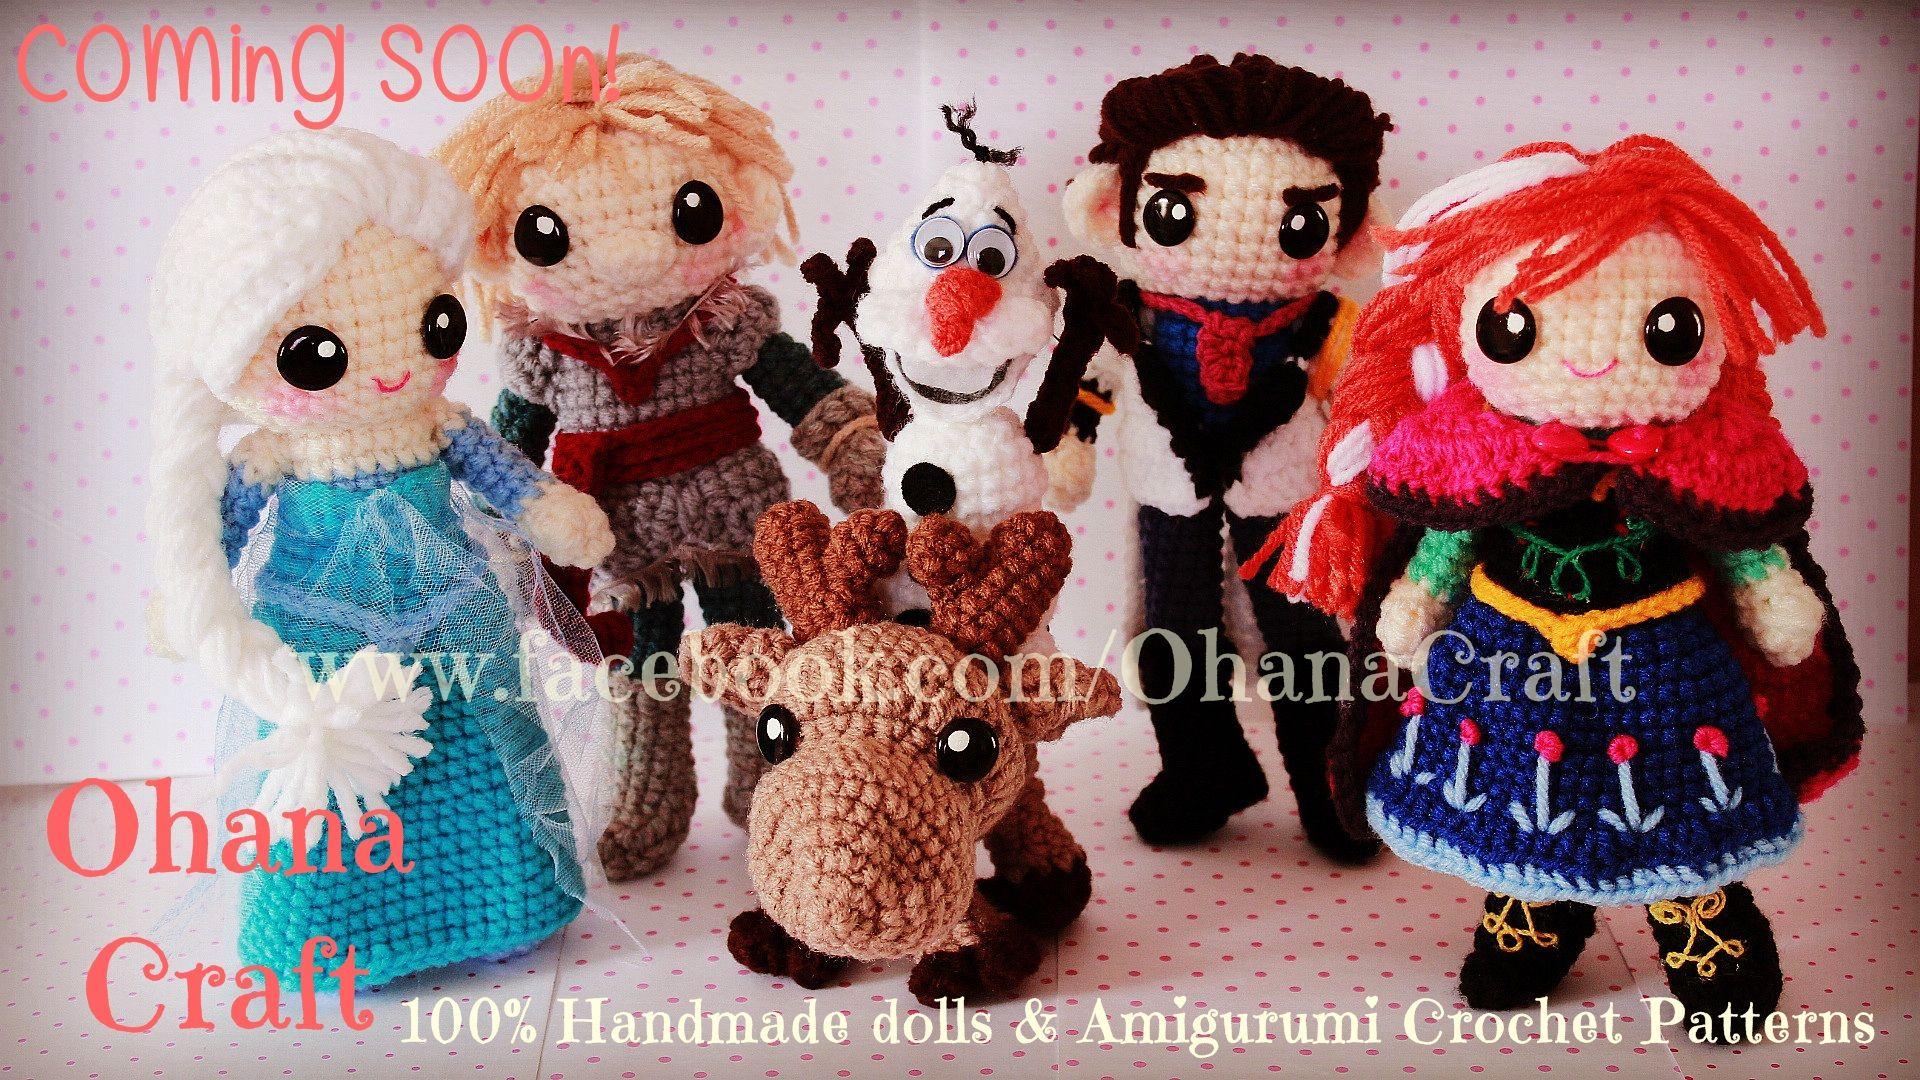 Crochet Frozen Doll : Crochet Frozen dolls and patterns ---- Queen Elsa crochet ...